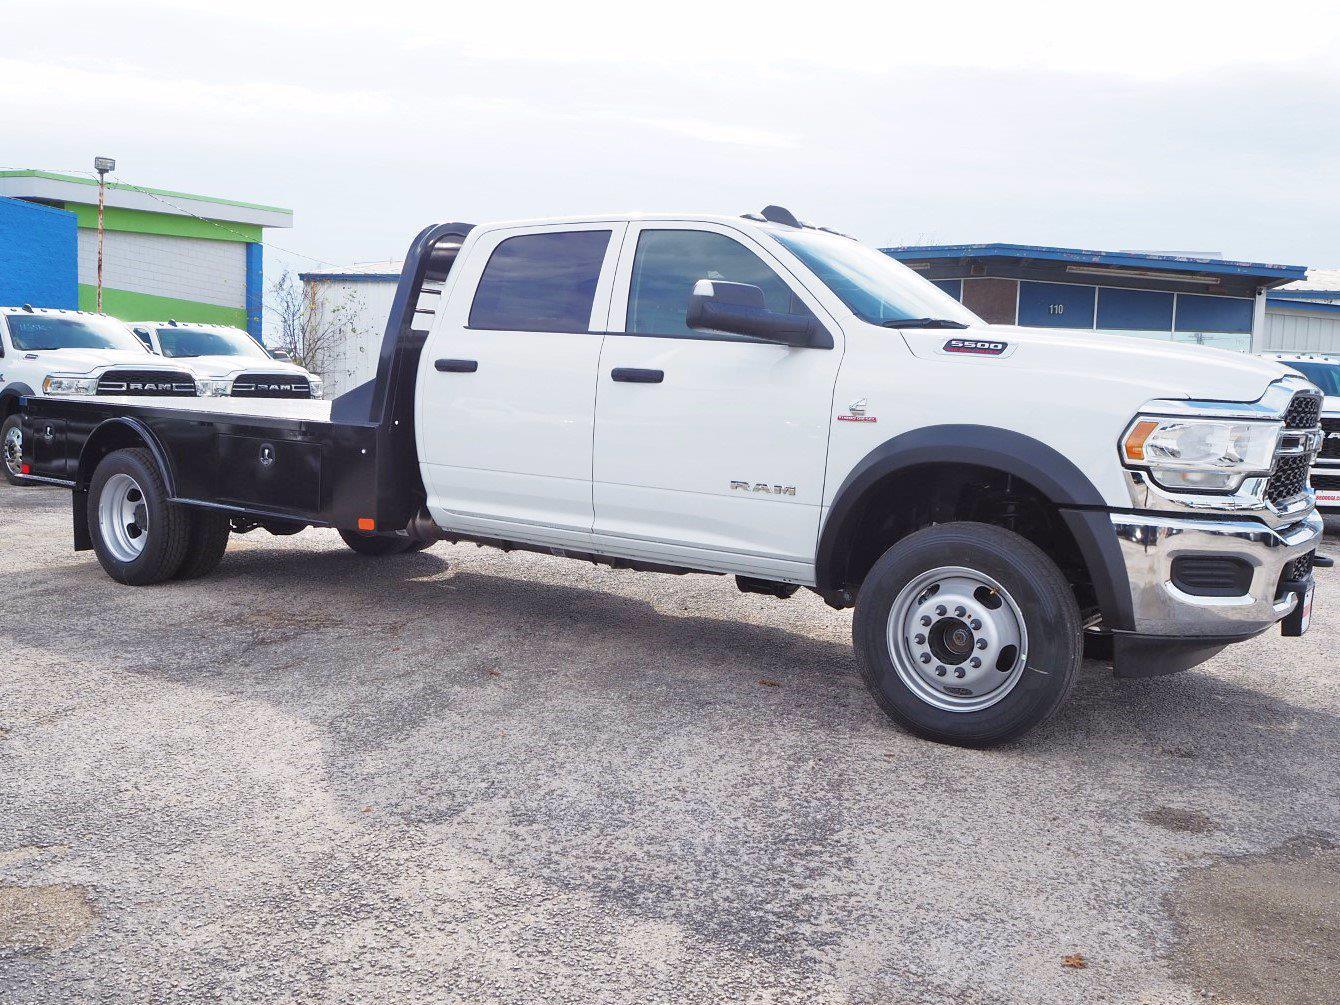 2020 Ram 5500 Crew Cab DRW 4x4, CM Truck Beds Platform Body #TG289003 - photo 1